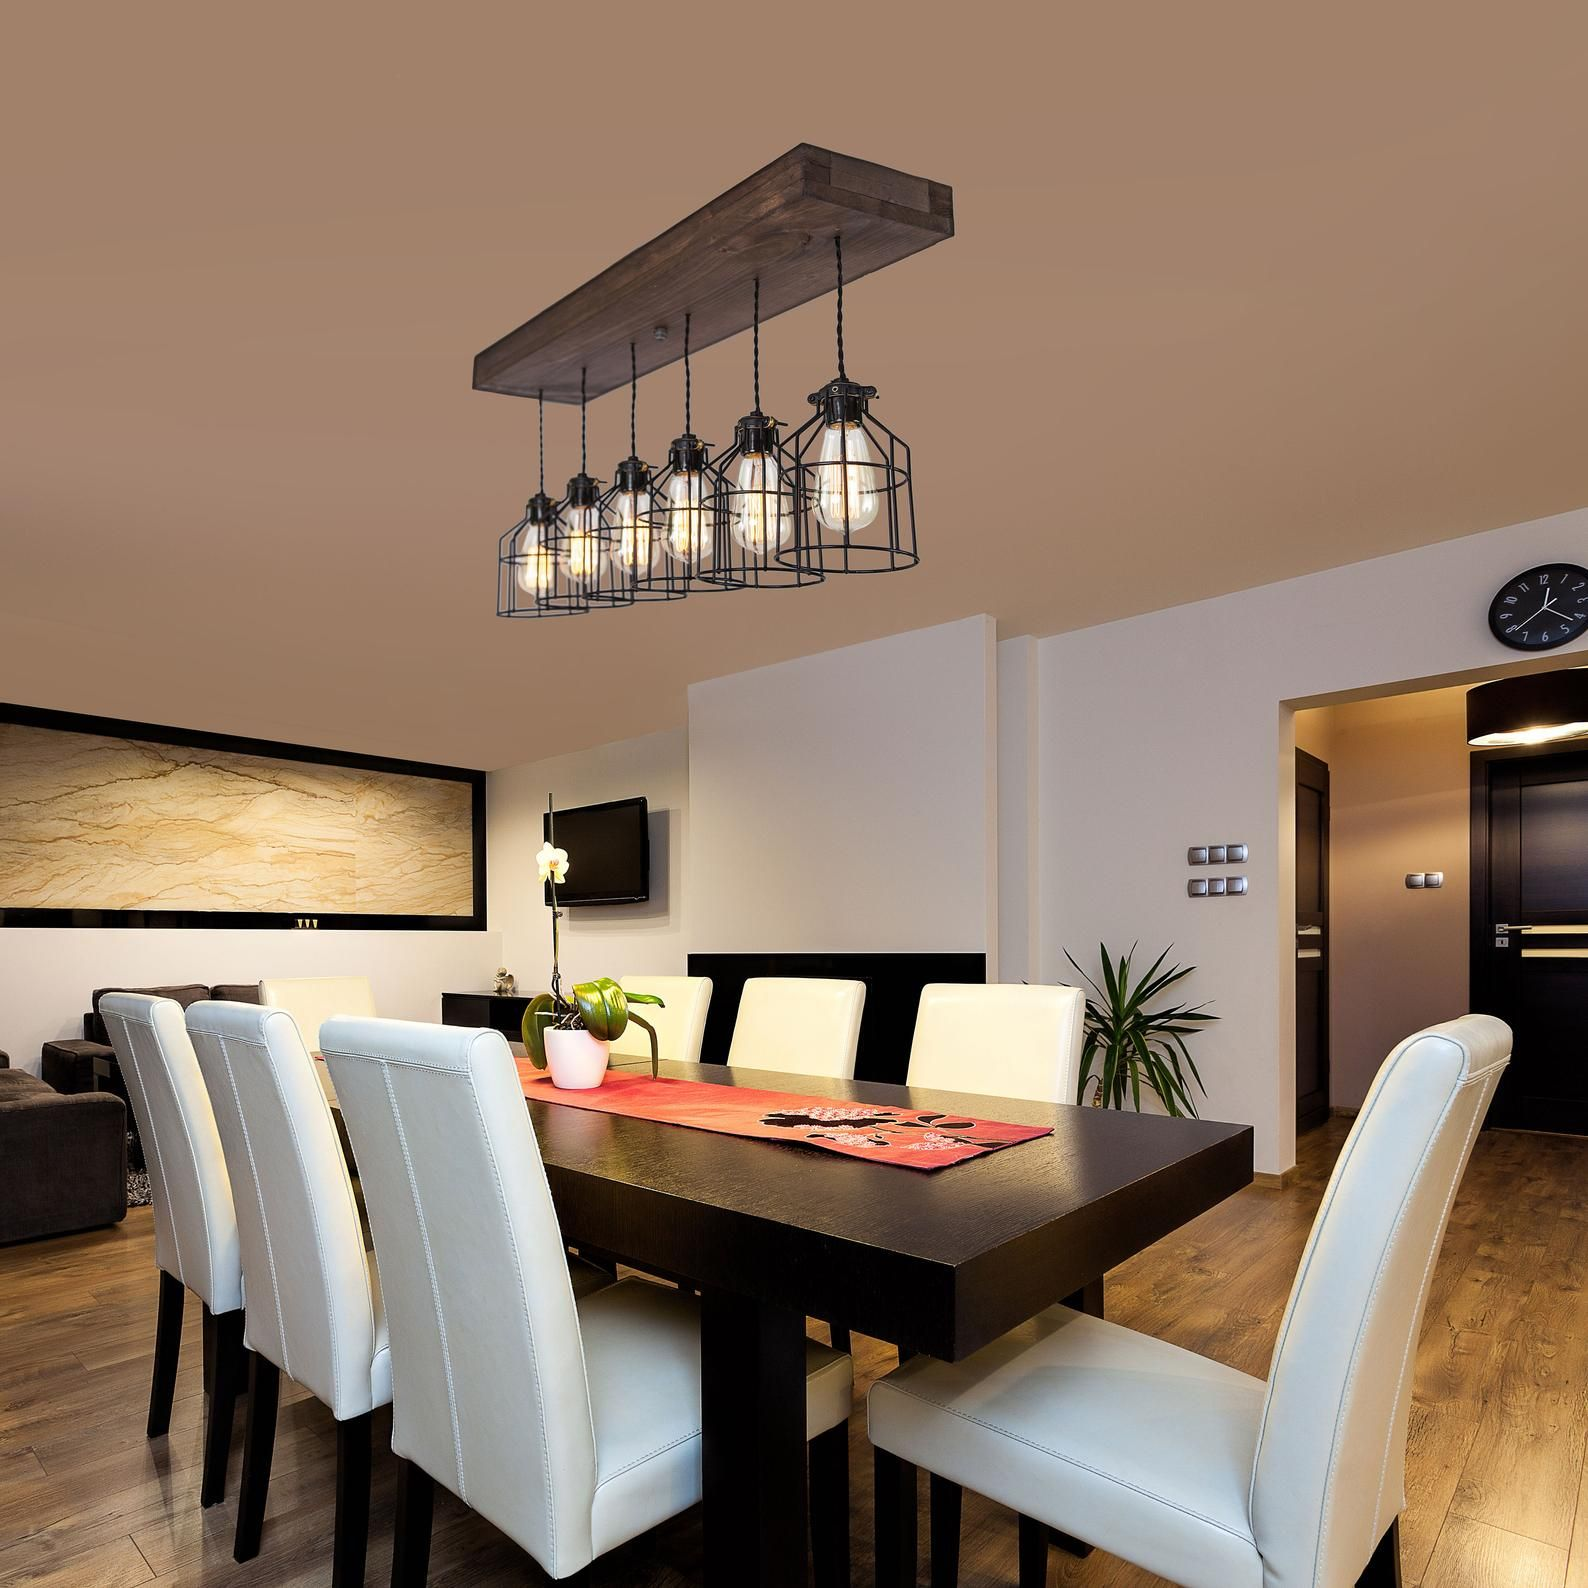 Farmhouse wood pendant light fixture / 6 pendant light